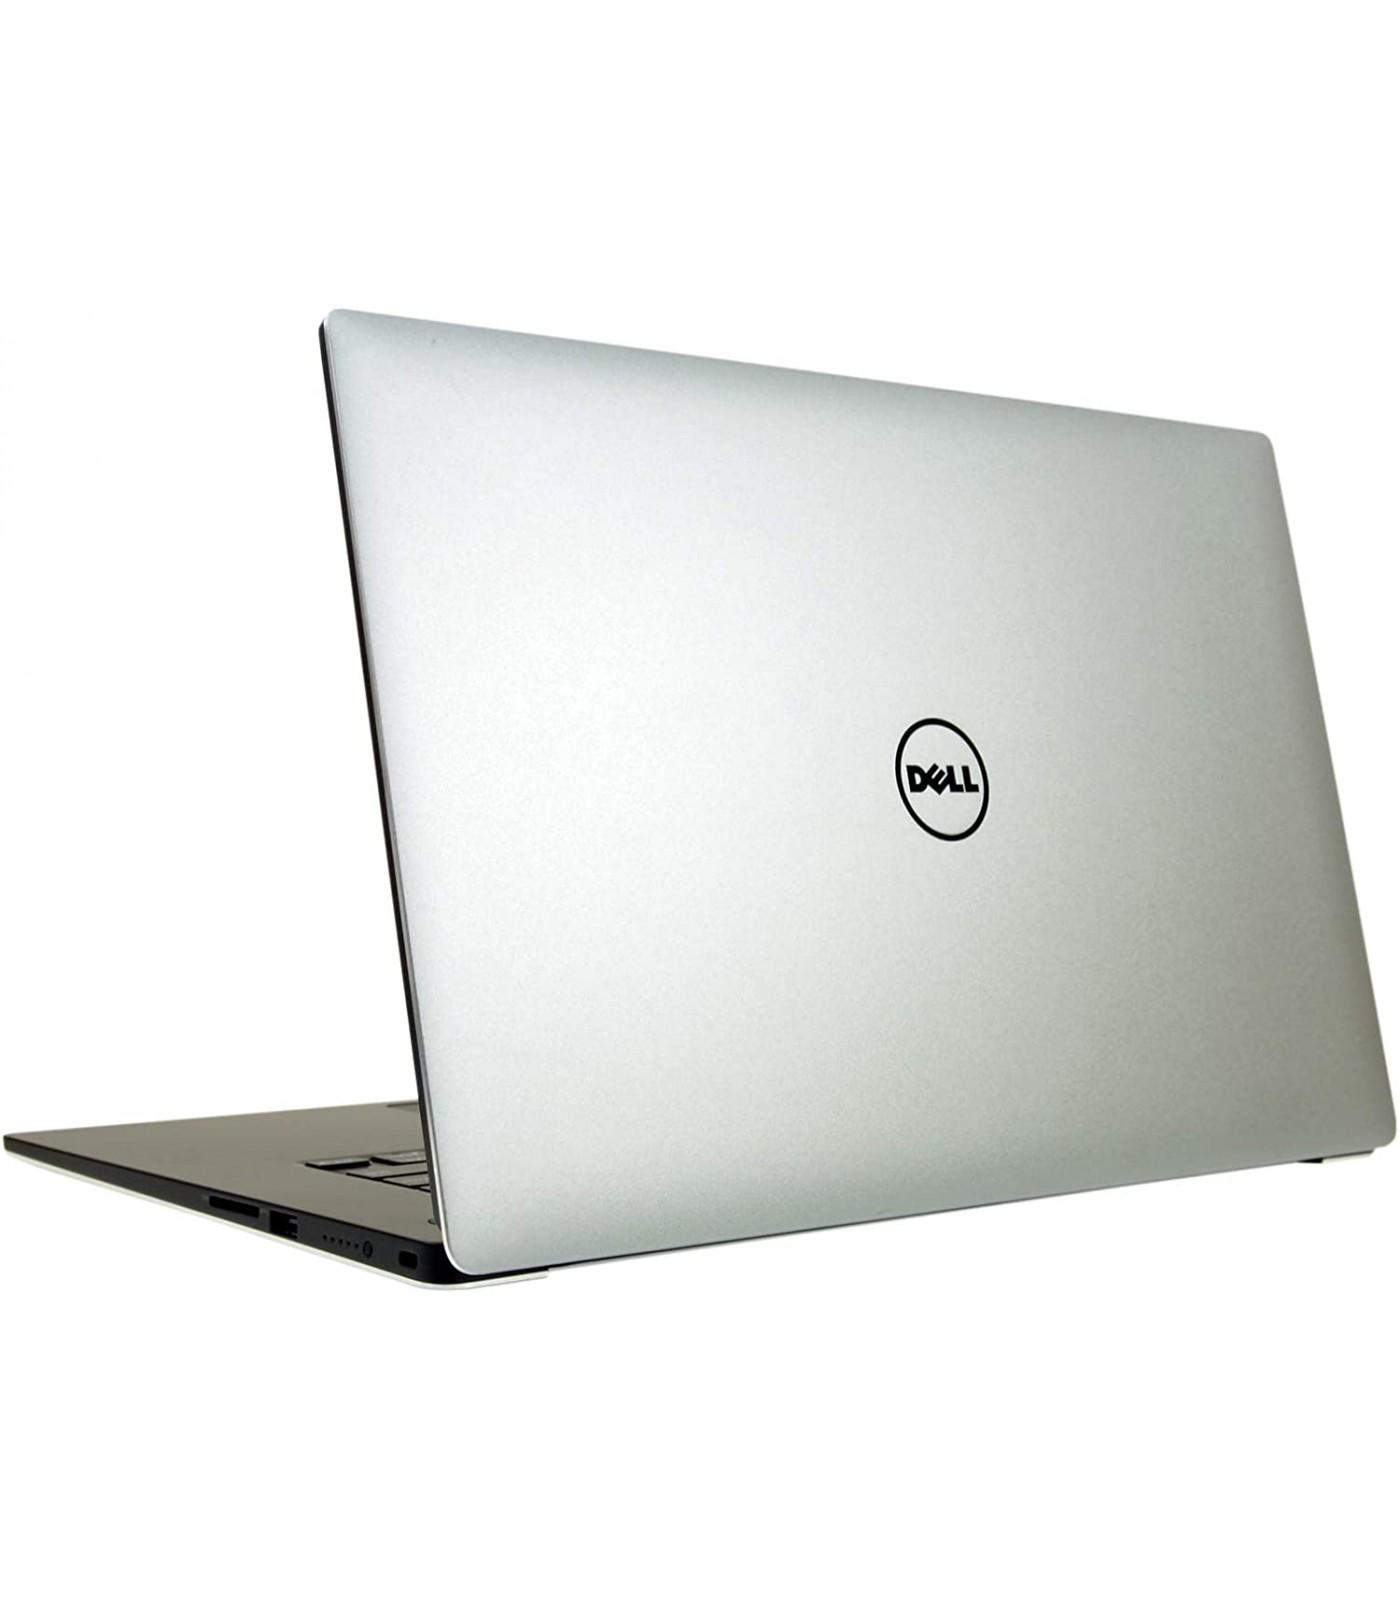 Poleasingowy laptop Dell Precision 5510 z Intel Core i7-6820HQ w Klasie A.